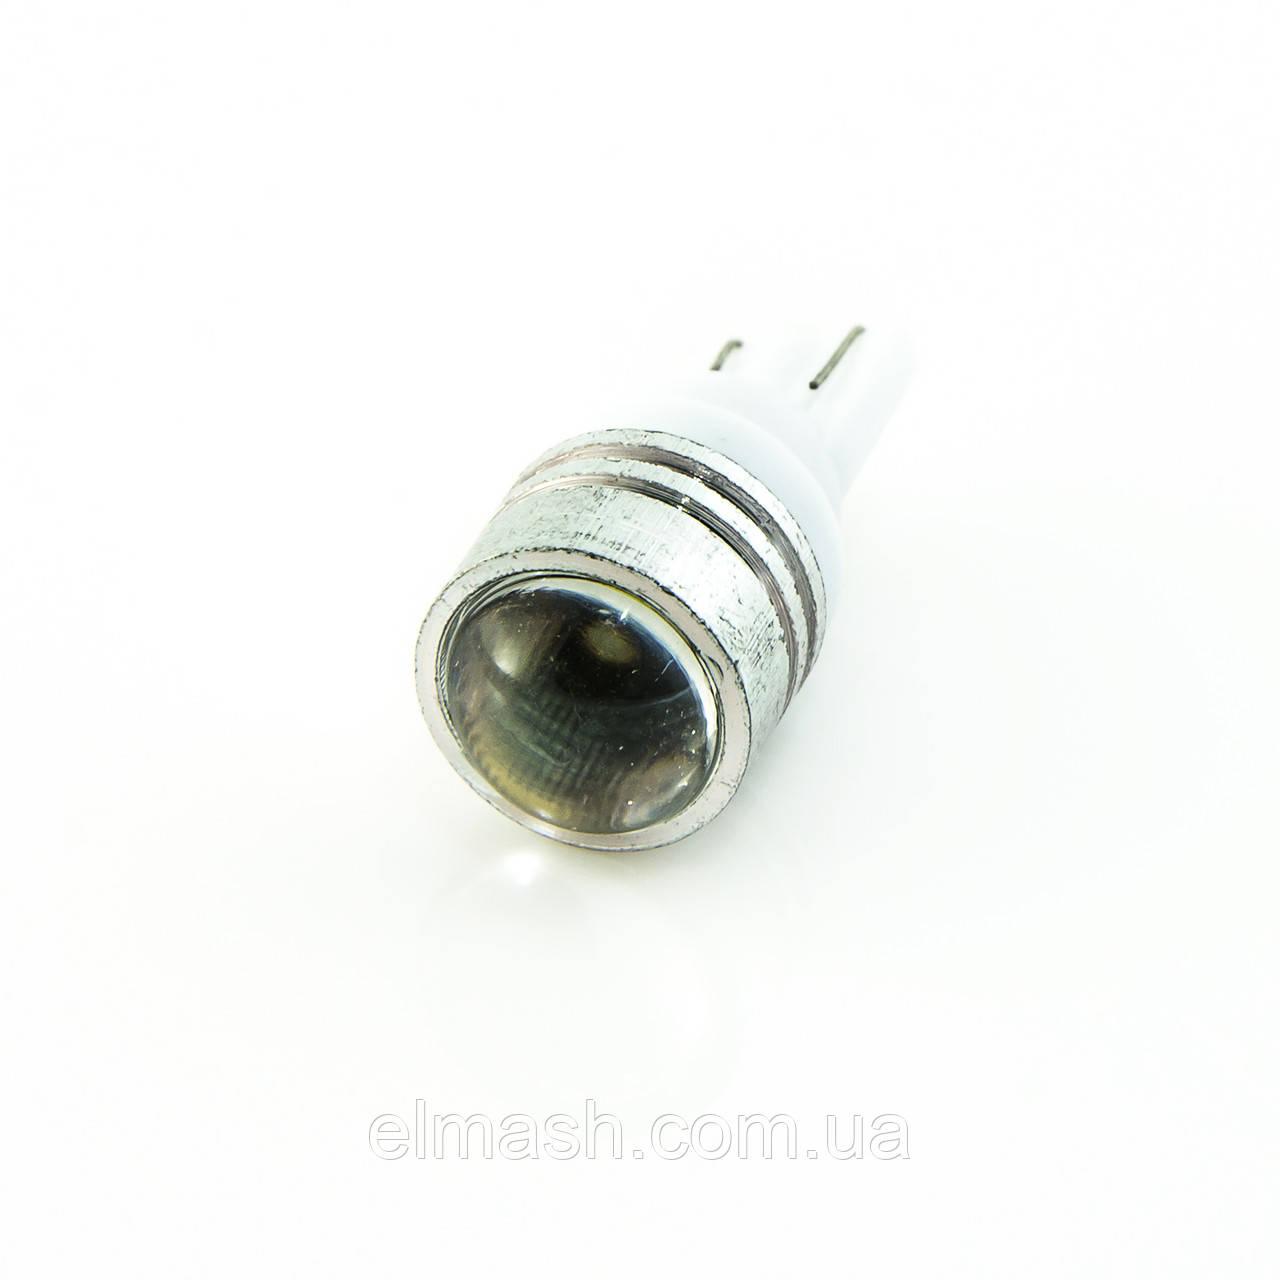 Лампа LED 12V T10 (W5W) 1W линза 35Lm БЕЛЫЙ